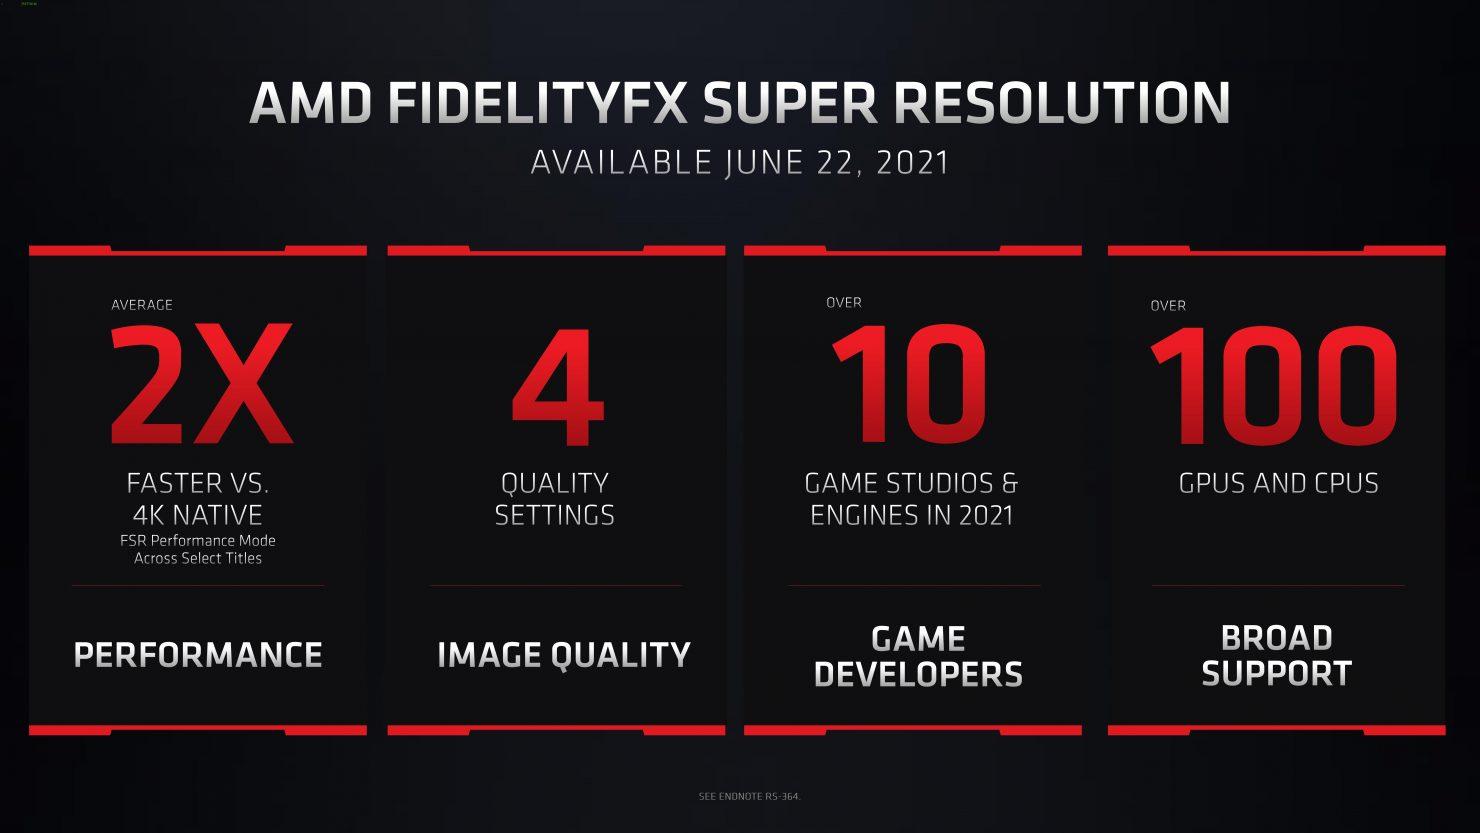 Intel заинтересована в технологии AMD FidelityFX Super Resolution для 3D-ускорителей Xe-HPG